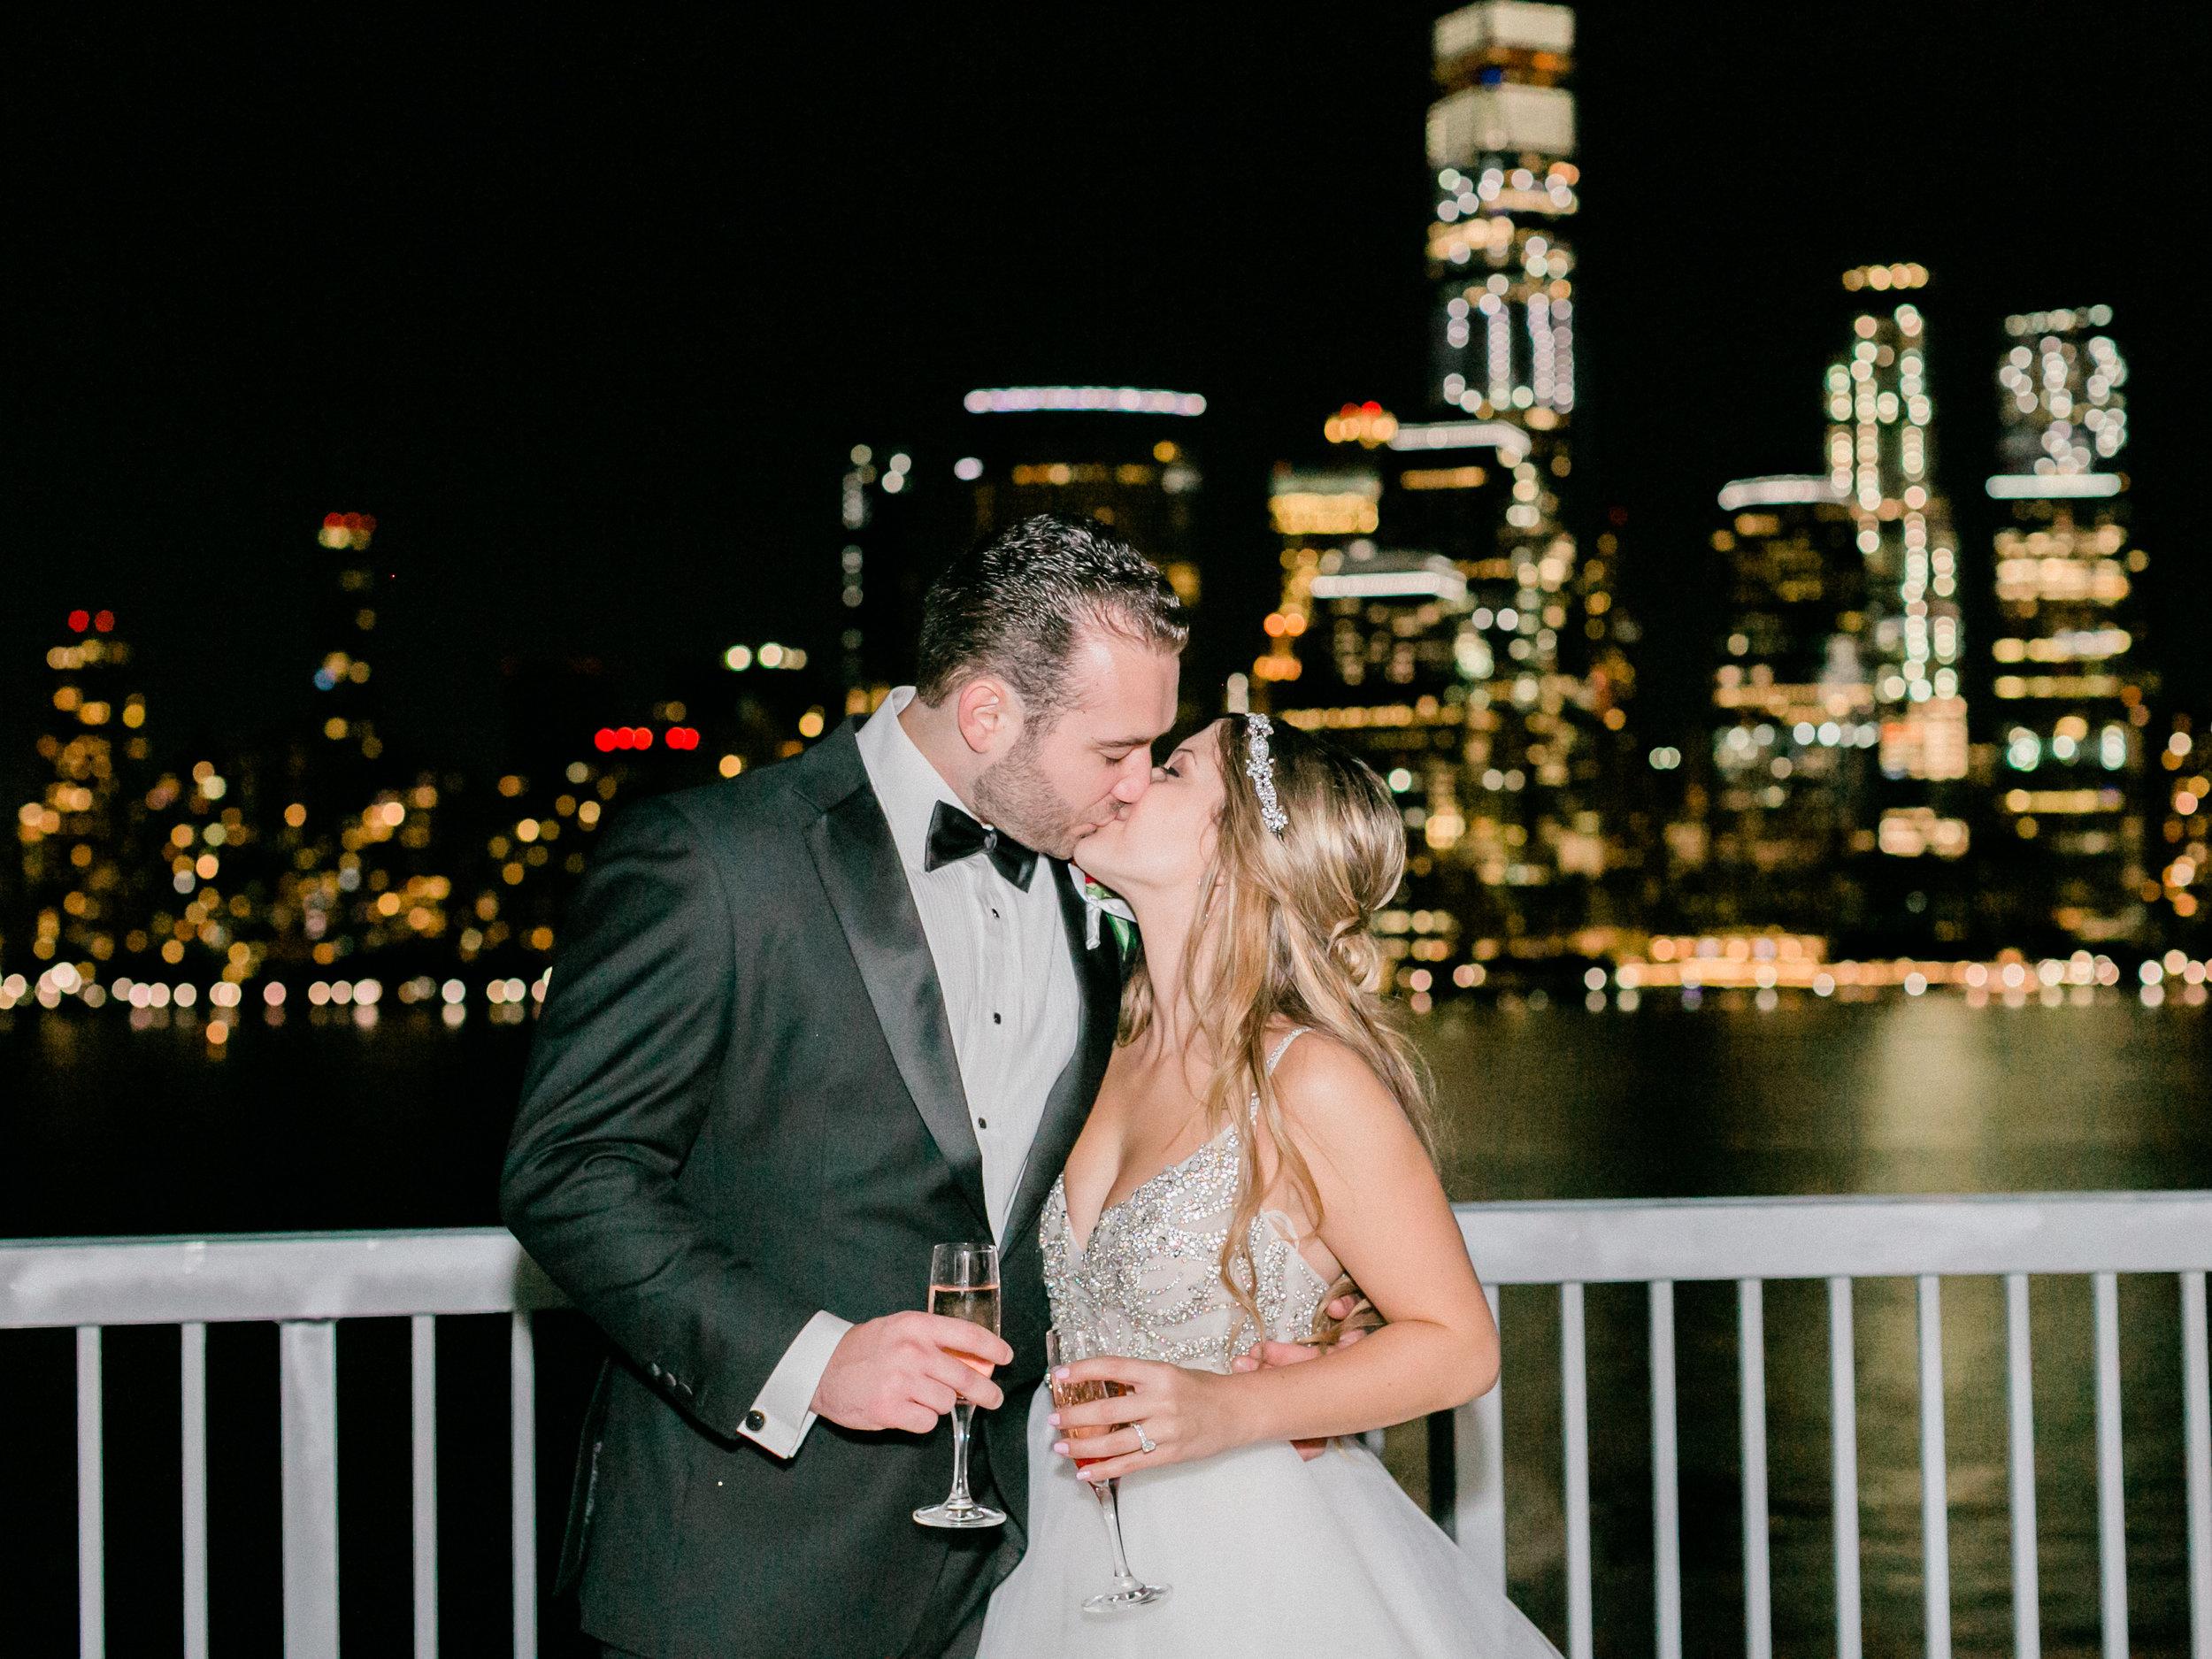 hyatt-regency-jersey-city-wedding-photographer72.jpg